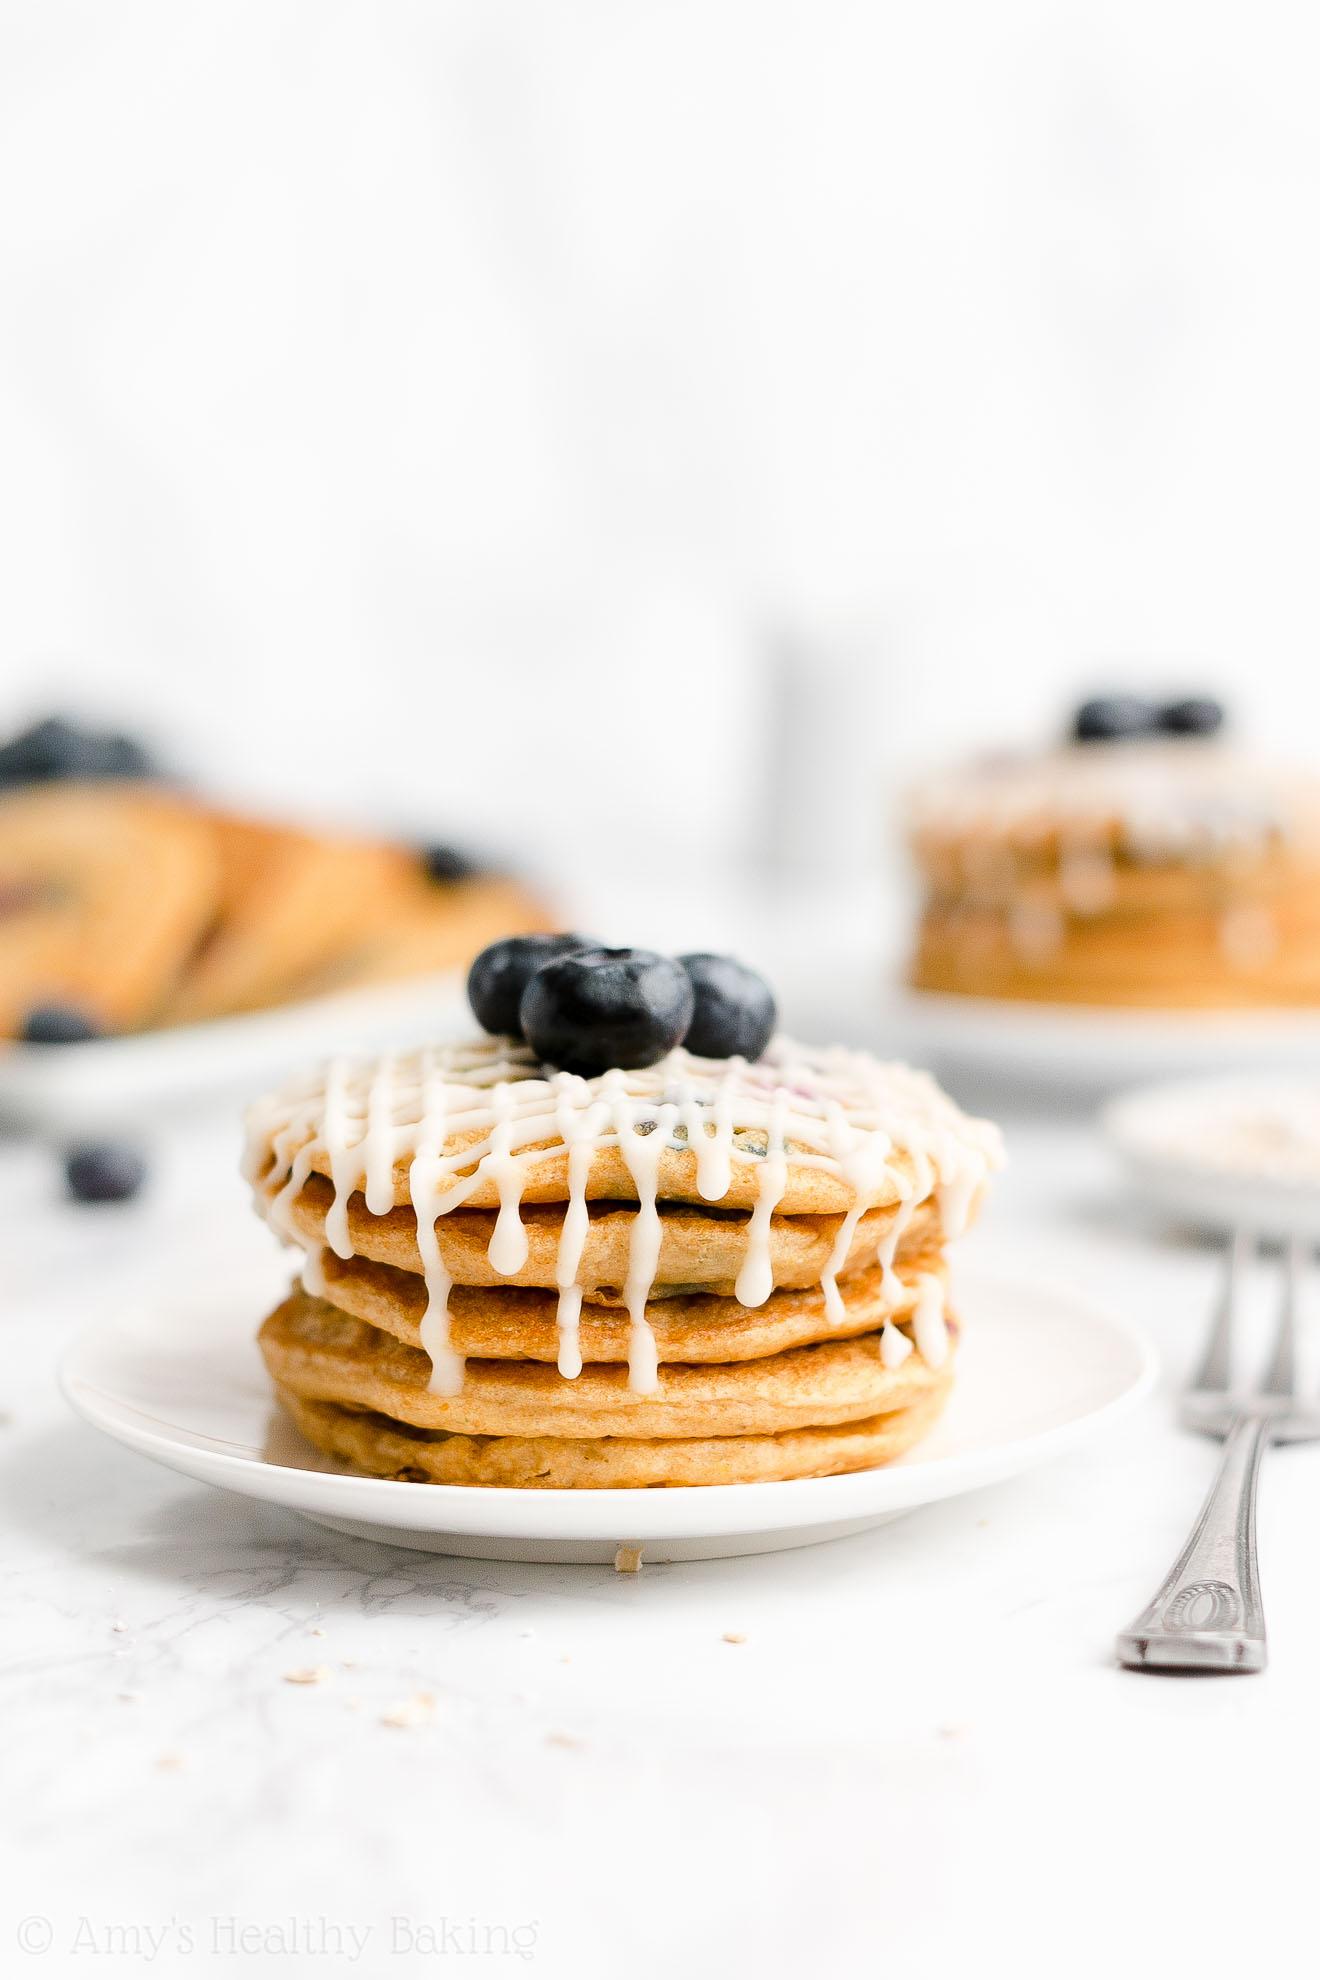 Easy Healthy Low Fat No Sugar Fluffy Greek Yogurt Blueberry Oatmeal Pancakes